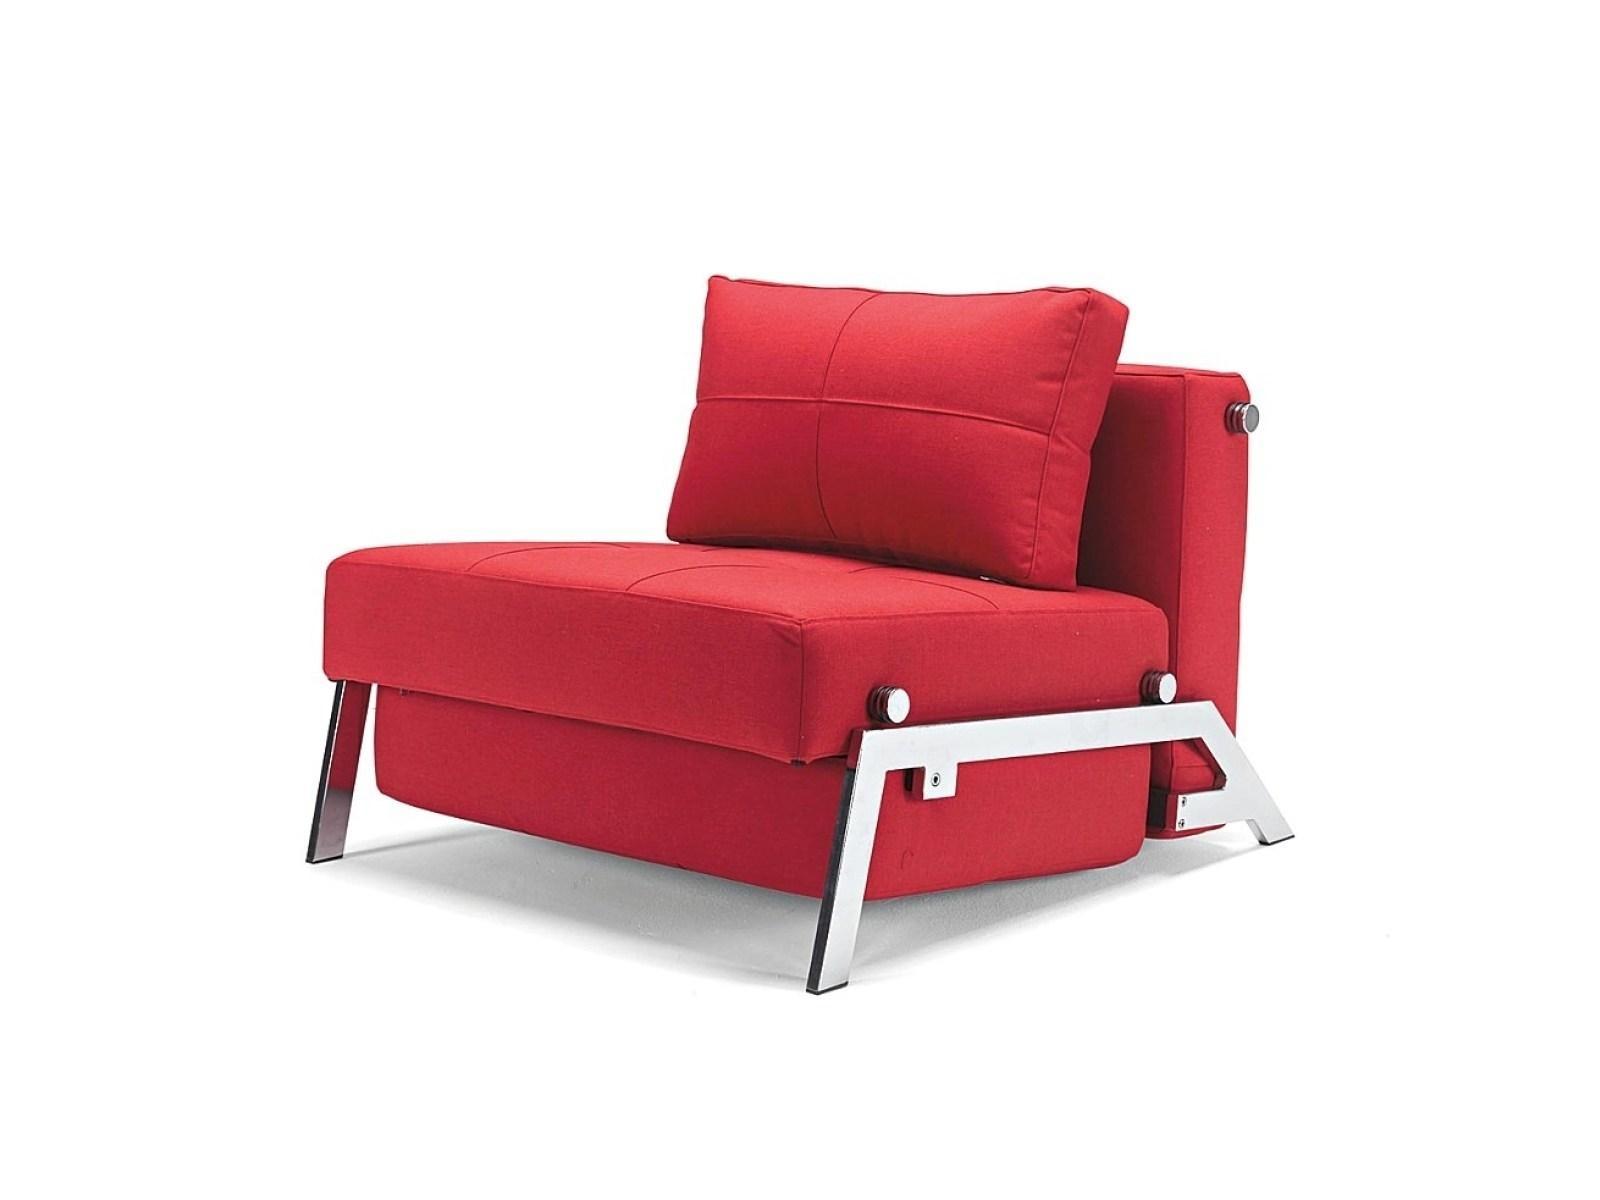 ▻ Sofa : 21 Wonderful Futon White Mattress Design Decor Futons Pertaining To Single Chair Sofa Bed (View 18 of 20)